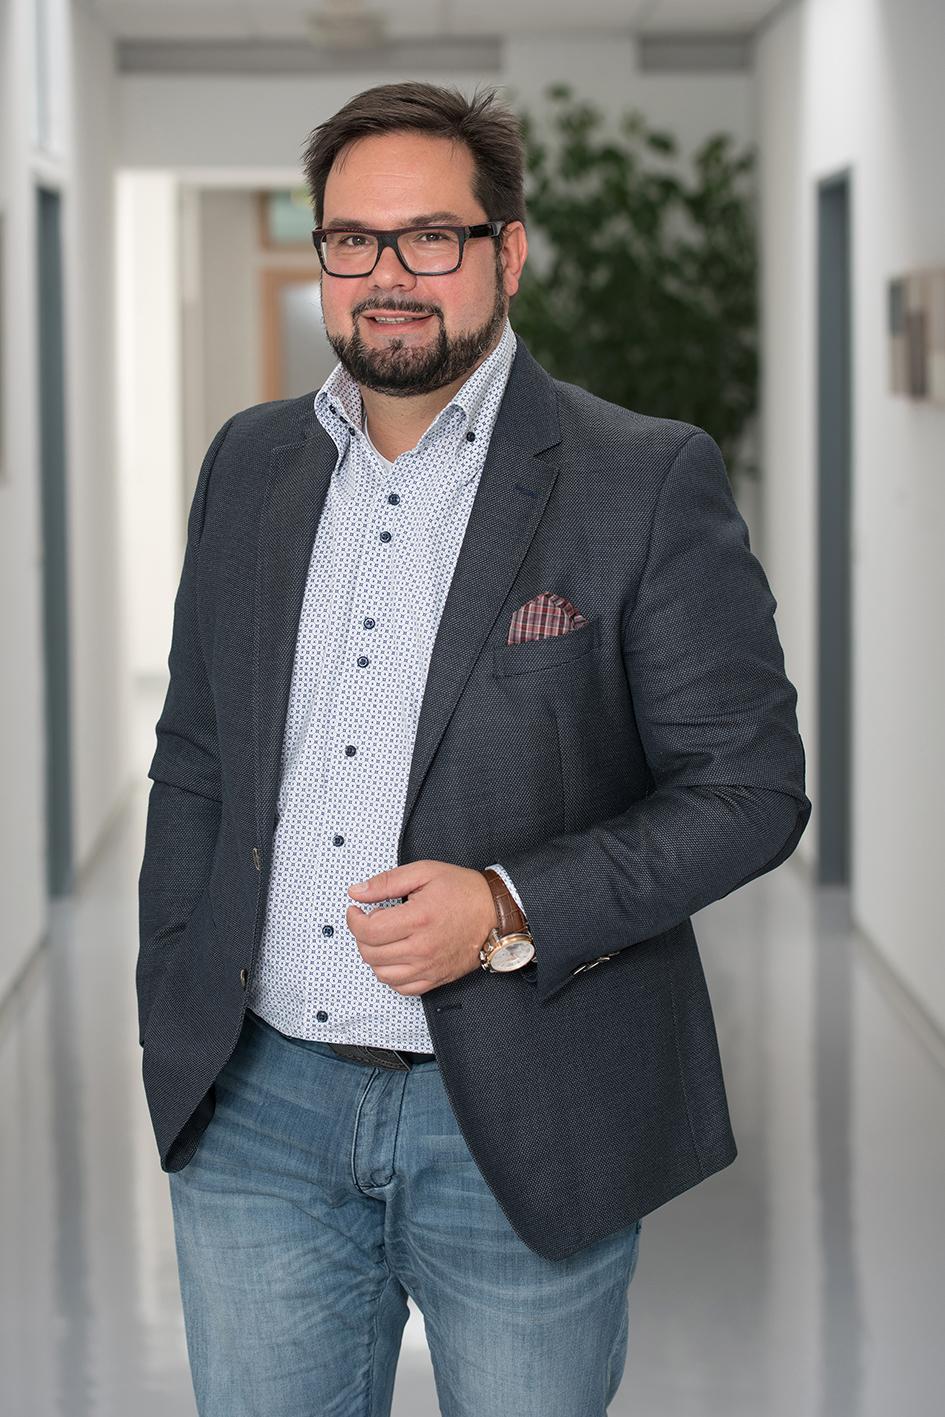 Markus Woschitz